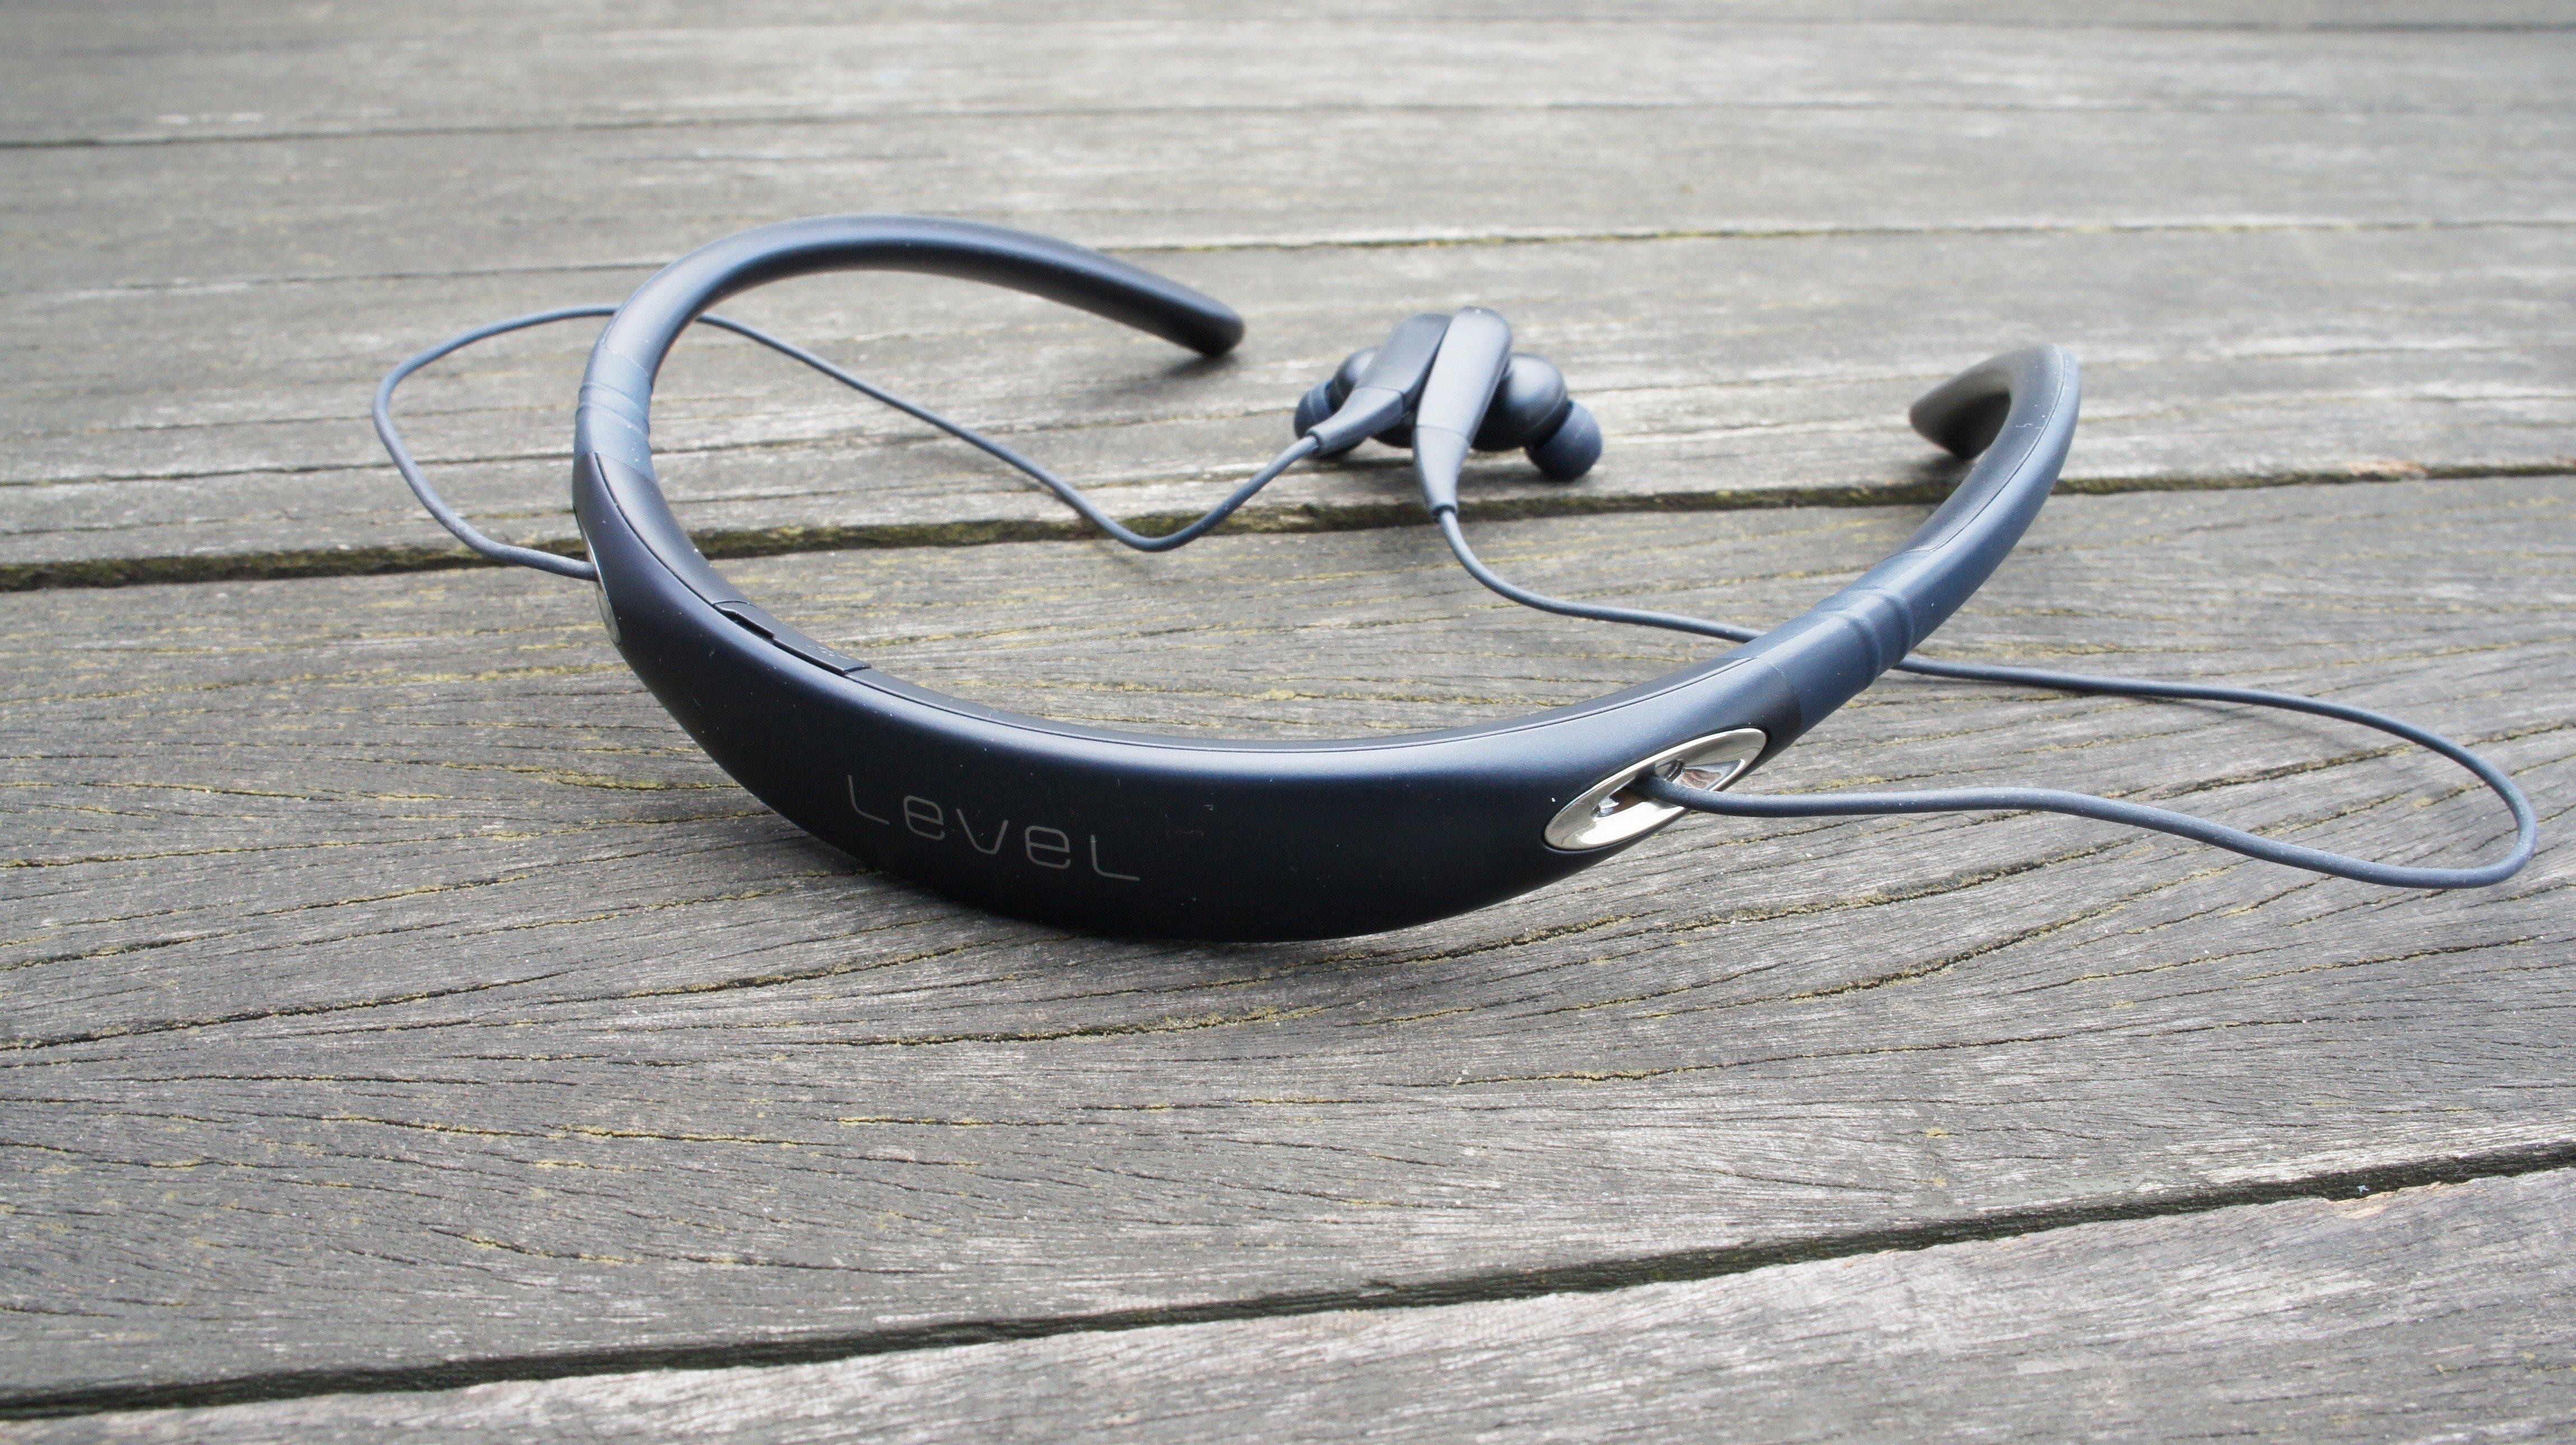 f8072c4c44b Samsung Level U Pro review - collar Bluetooth headphones | Expert Reviews